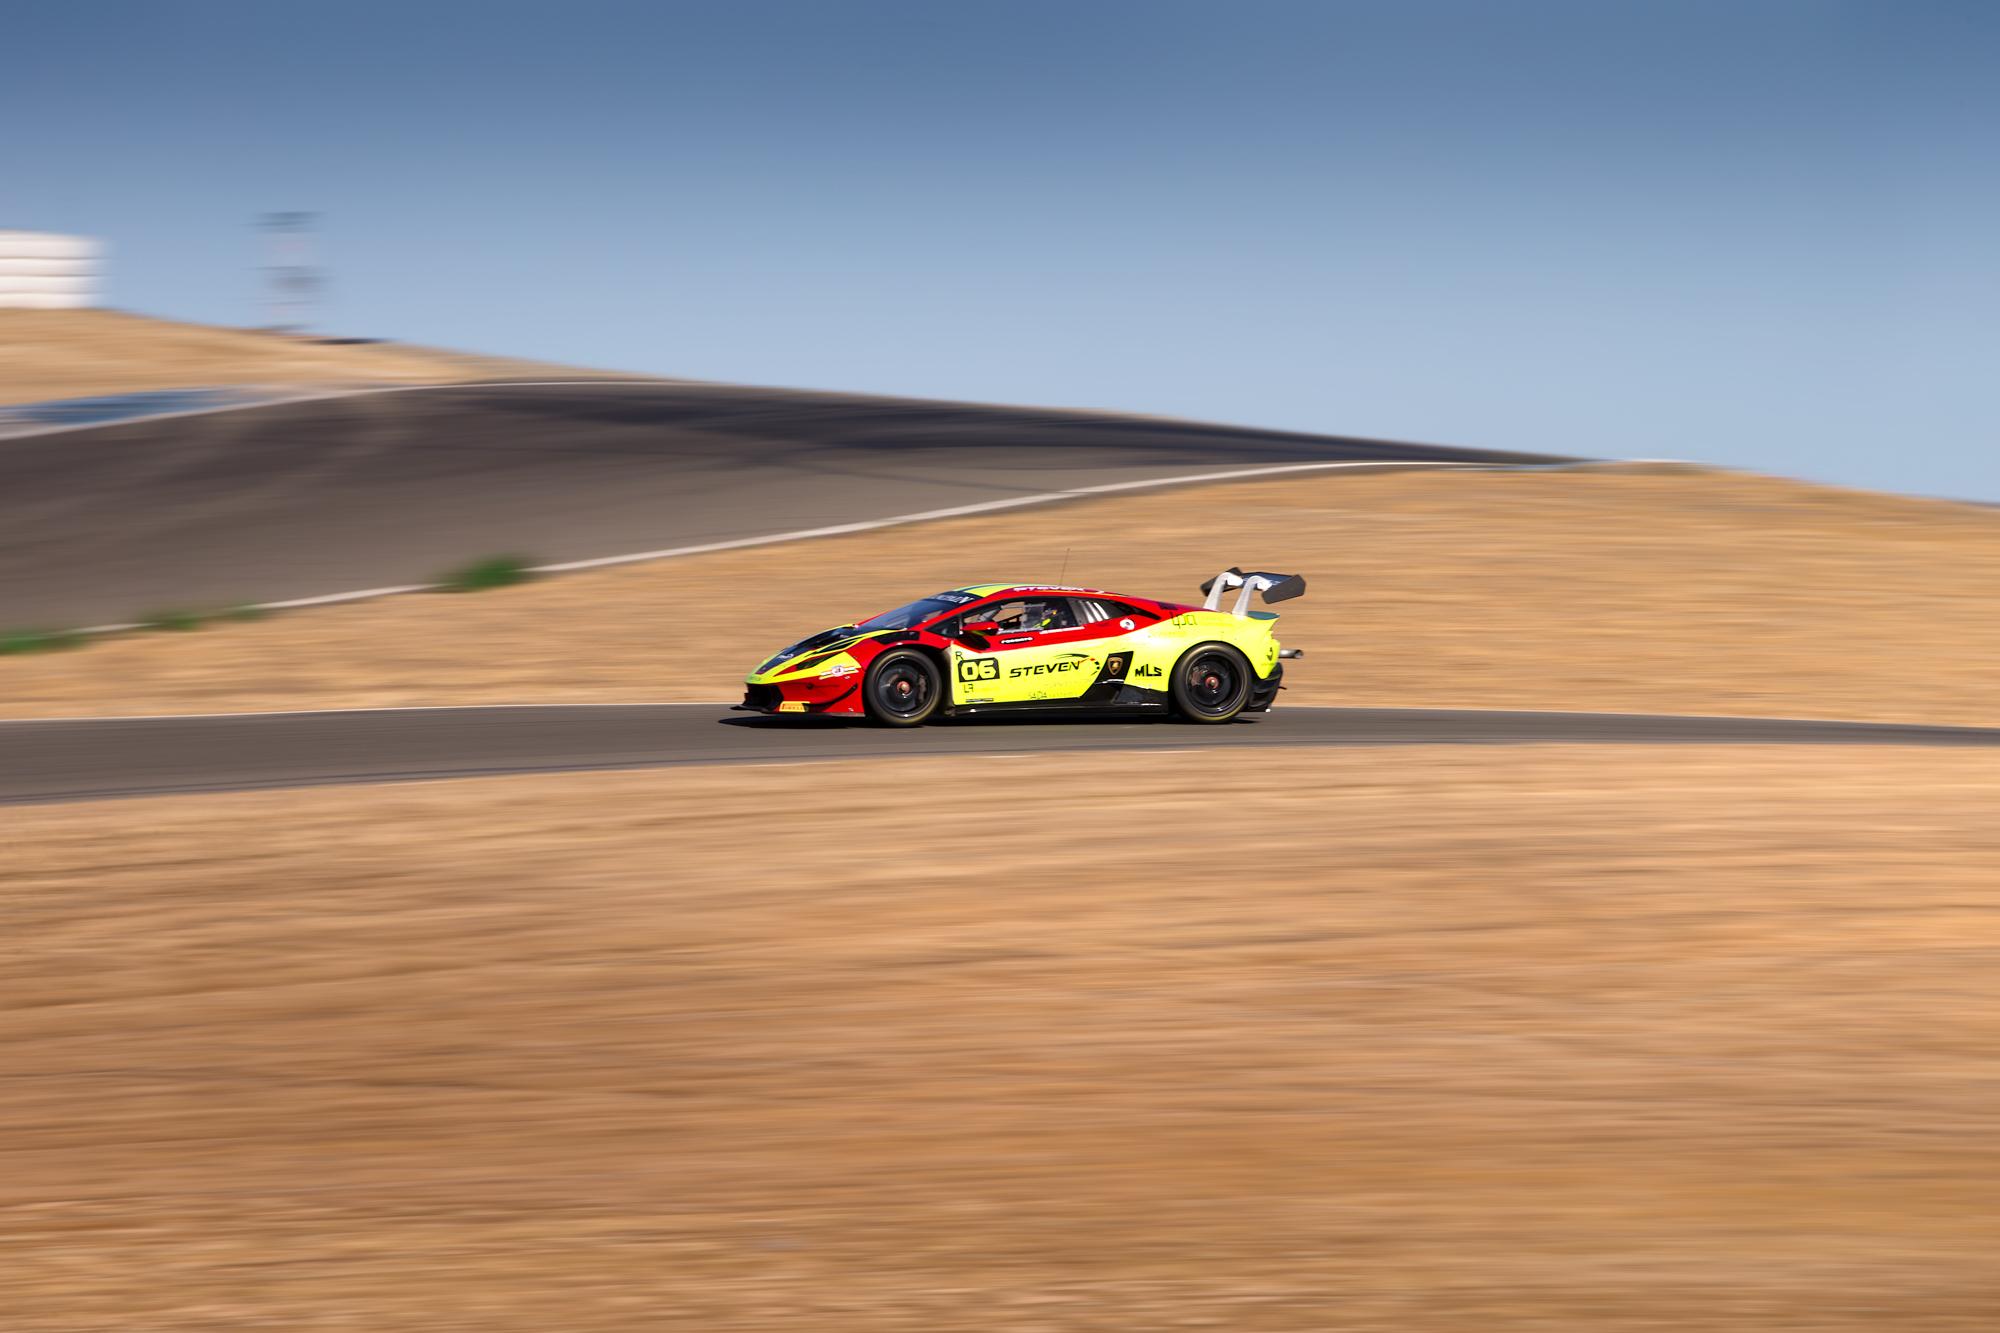 Steven-Racing-20171006-45235.jpg